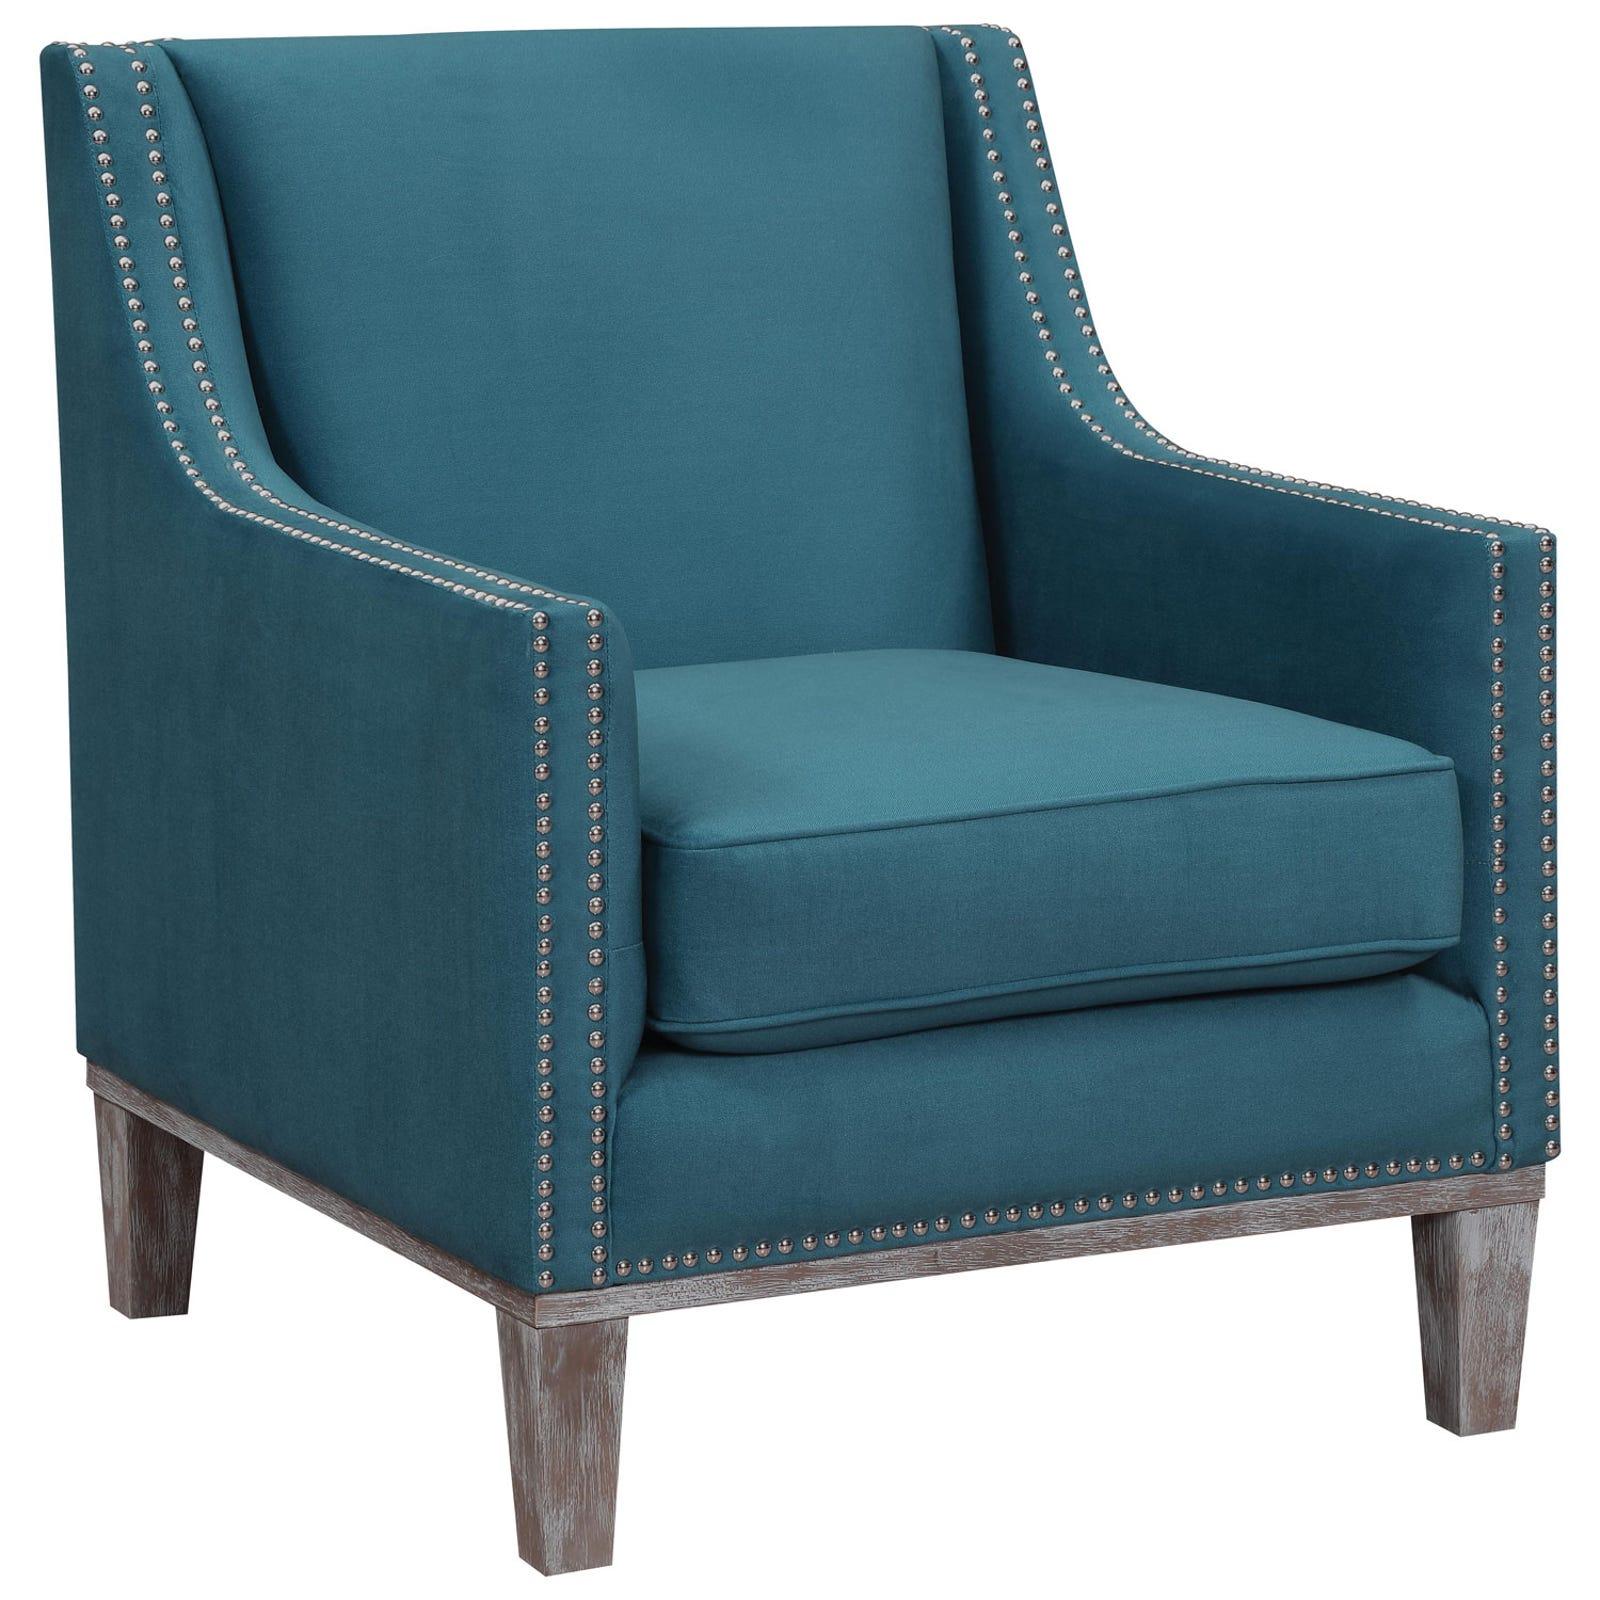 Prime Living Room Furniture Best Buy Canada Dailytribune Chair Design For Home Dailytribuneorg